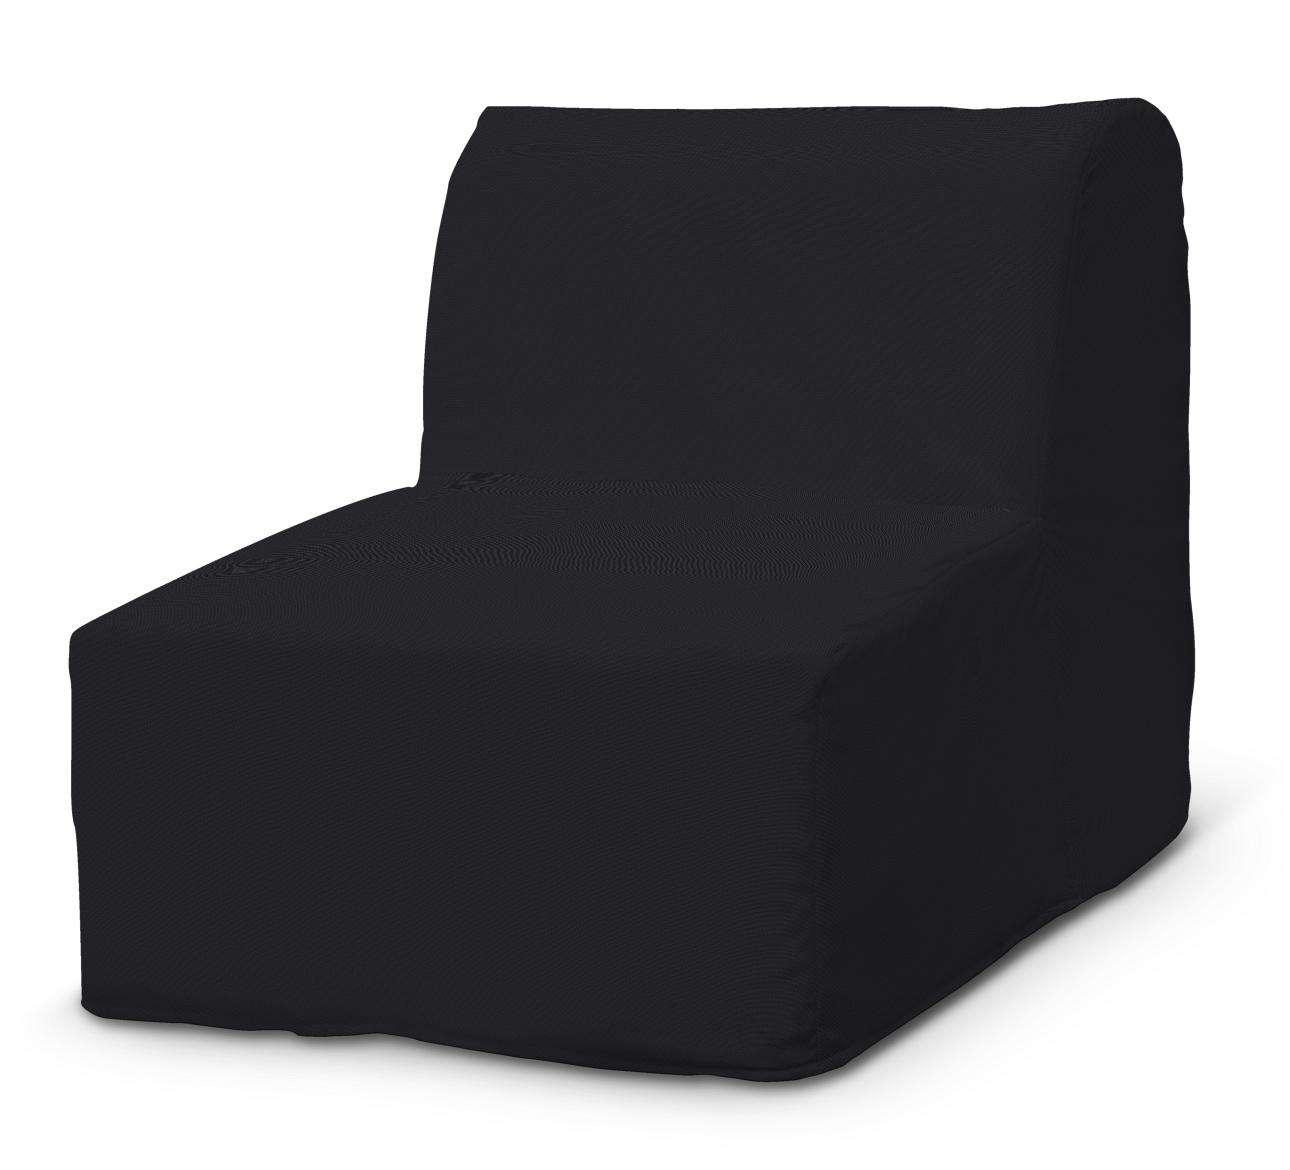 Pokrowiec na fotel Lycksele prosty fotel Lycksele w kolekcji Etna , tkanina: 705-00